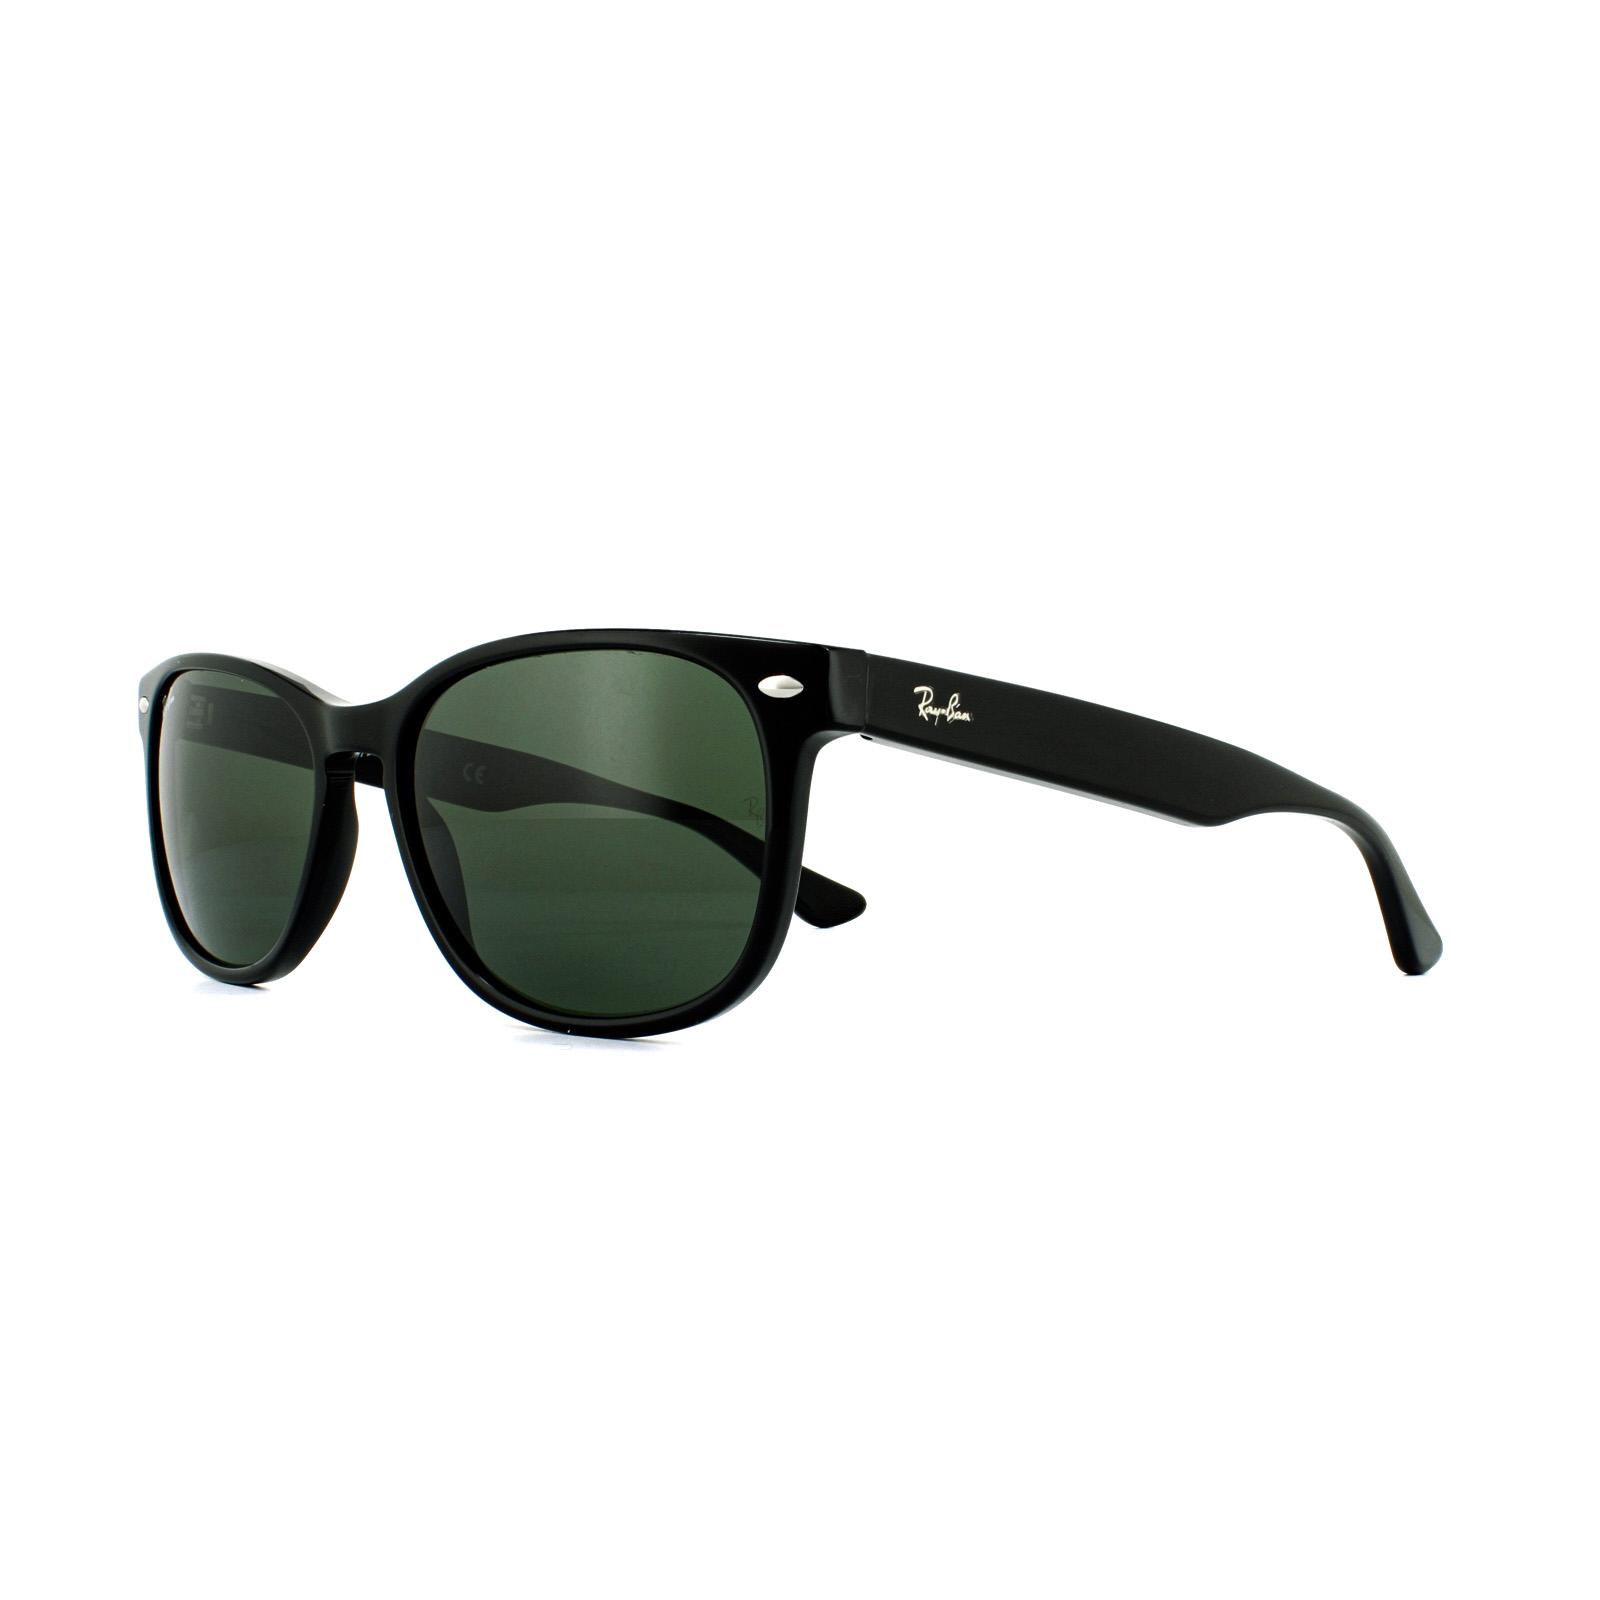 800537bd72 Cheap Ray-Ban RB2184 - Discounted Sunglasses